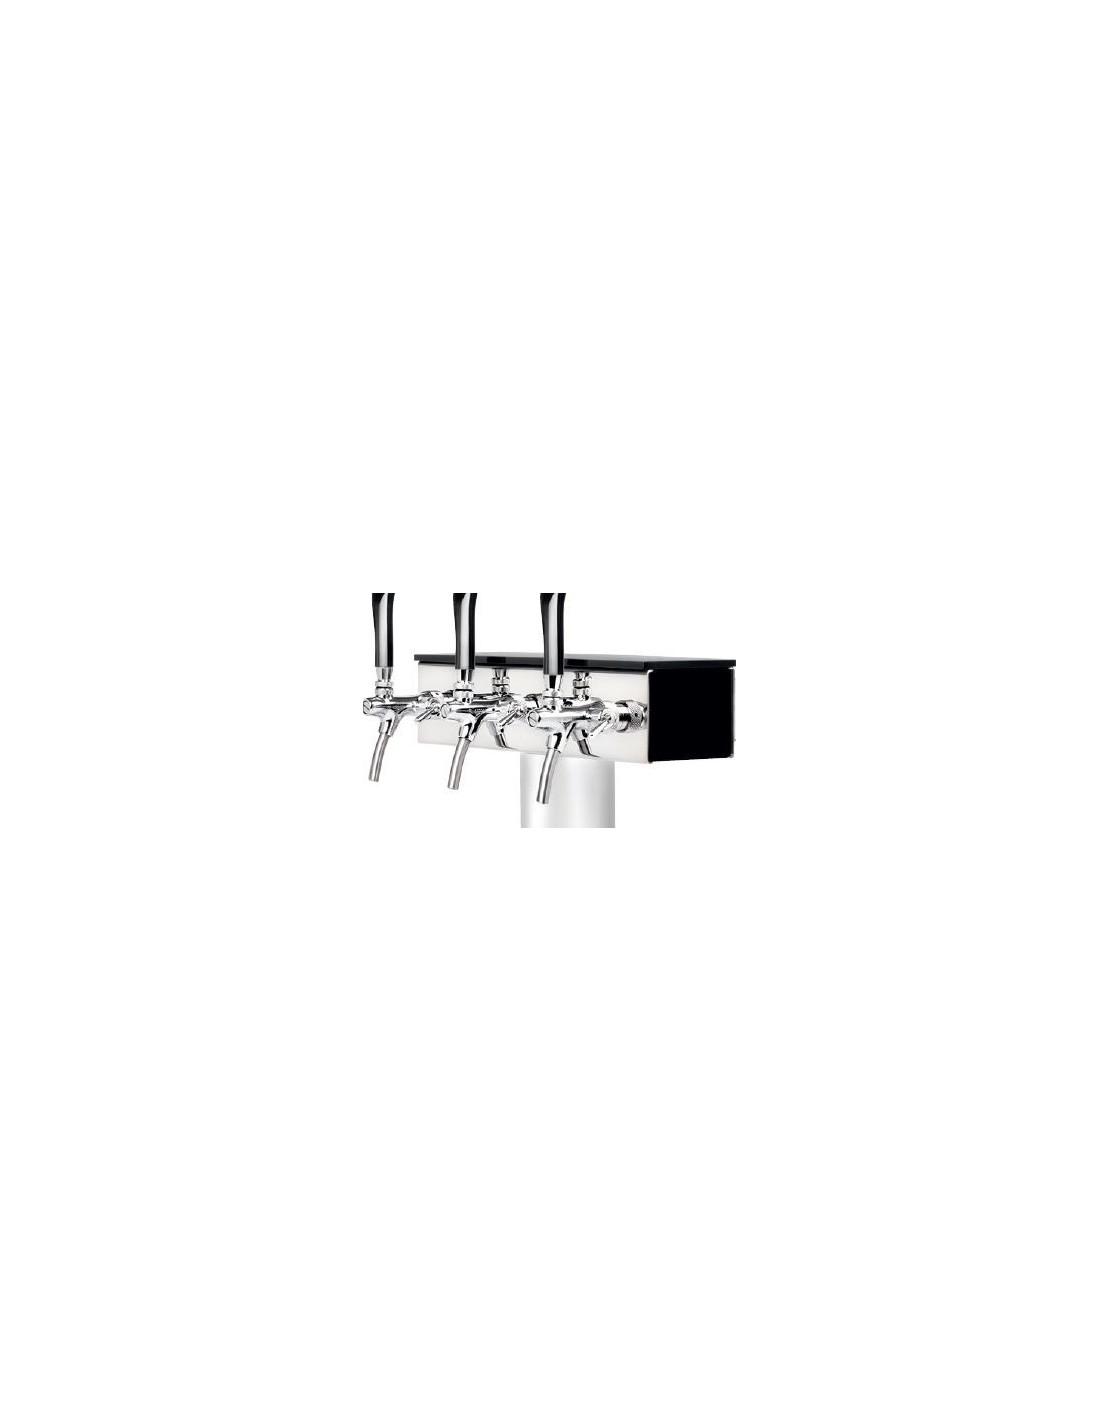 "VYR02298 - Tapptornschassi ""T GRAND x3"" svart högblank akryl"